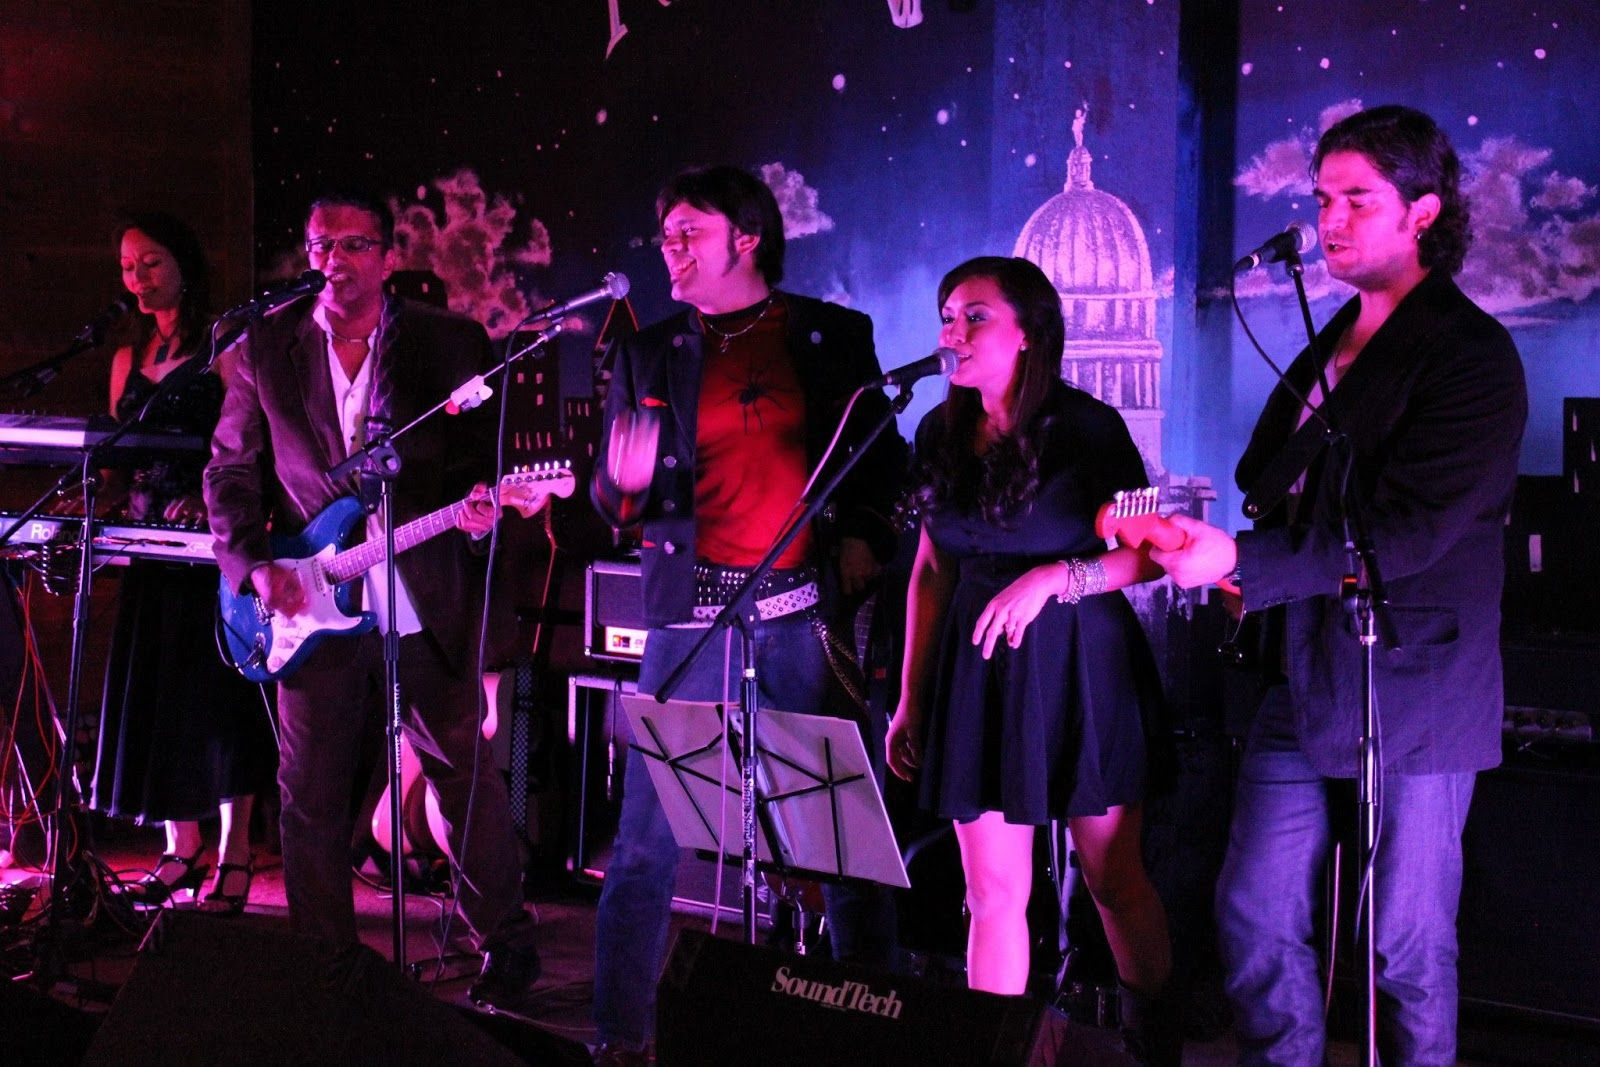 Nightlive Band